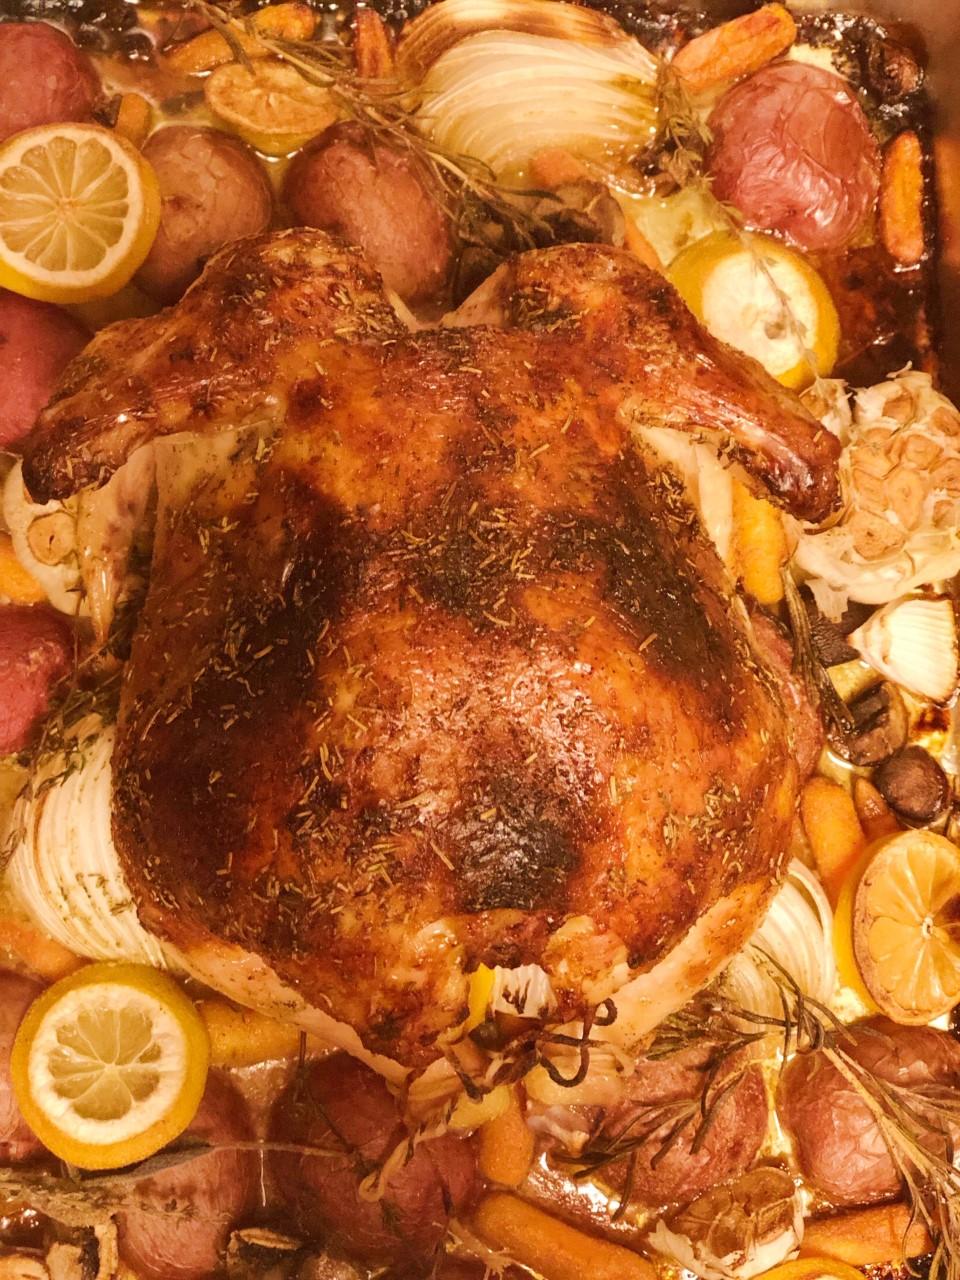 roast chicken, holiday chicken, holiday roast chicken, thanksgiving dinner, roasted chicken, roasted chicken, red potatoes, roast chicken meal, family dinner ideas, holiday dinner ideas